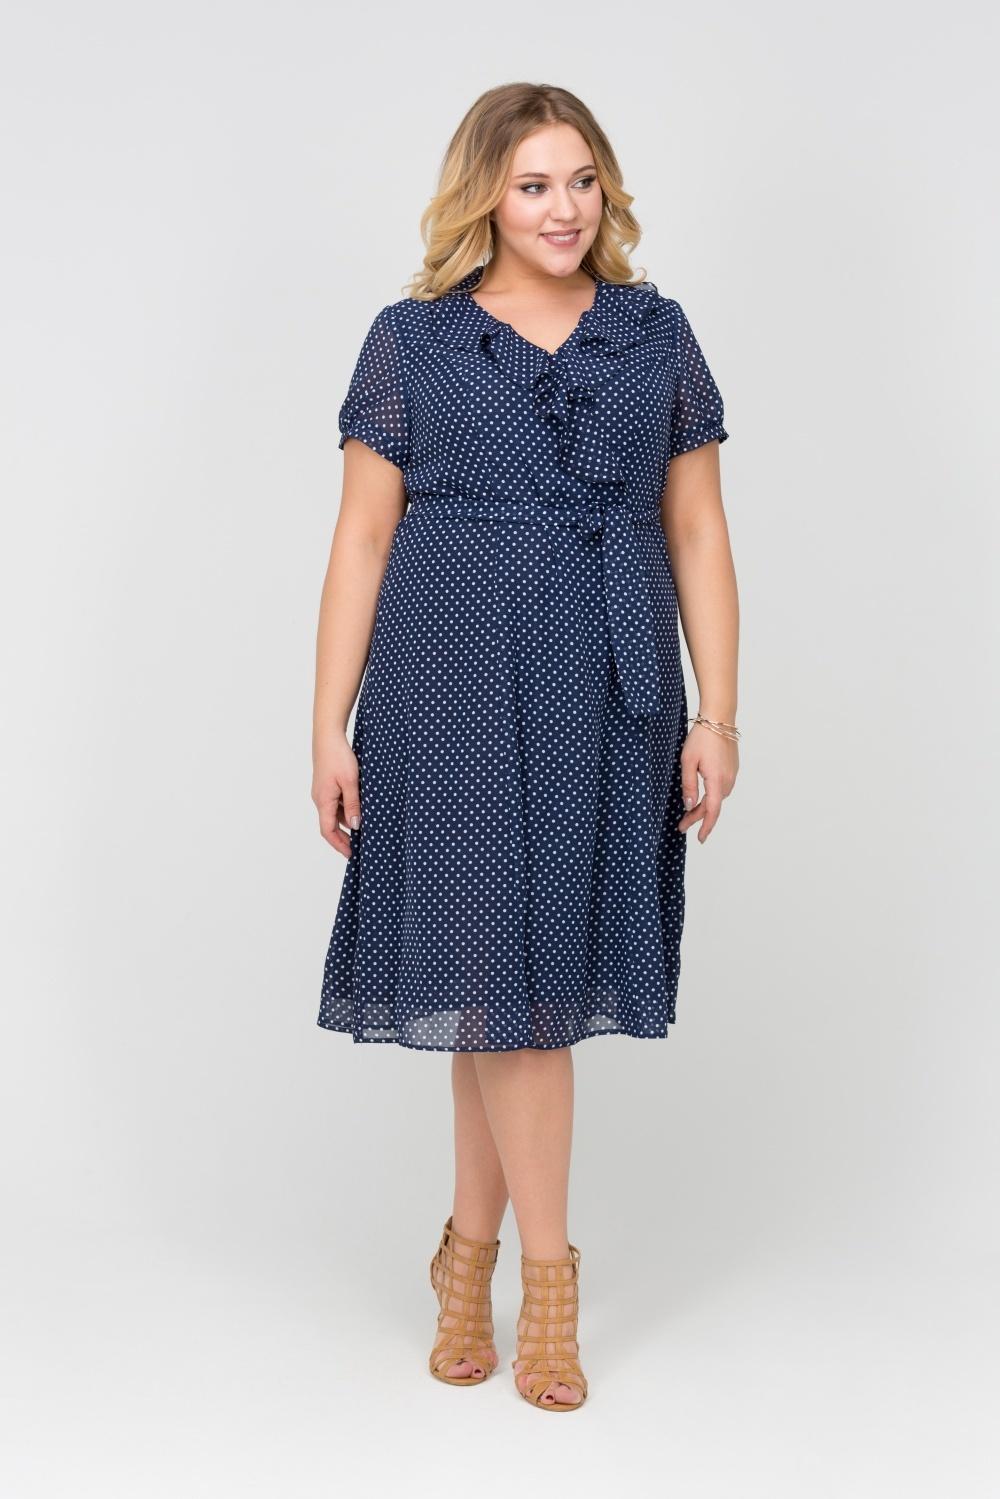 Платья Платье Джуди синее 4b6802c7cb9e909c5ca23dd6243225bf.jpg